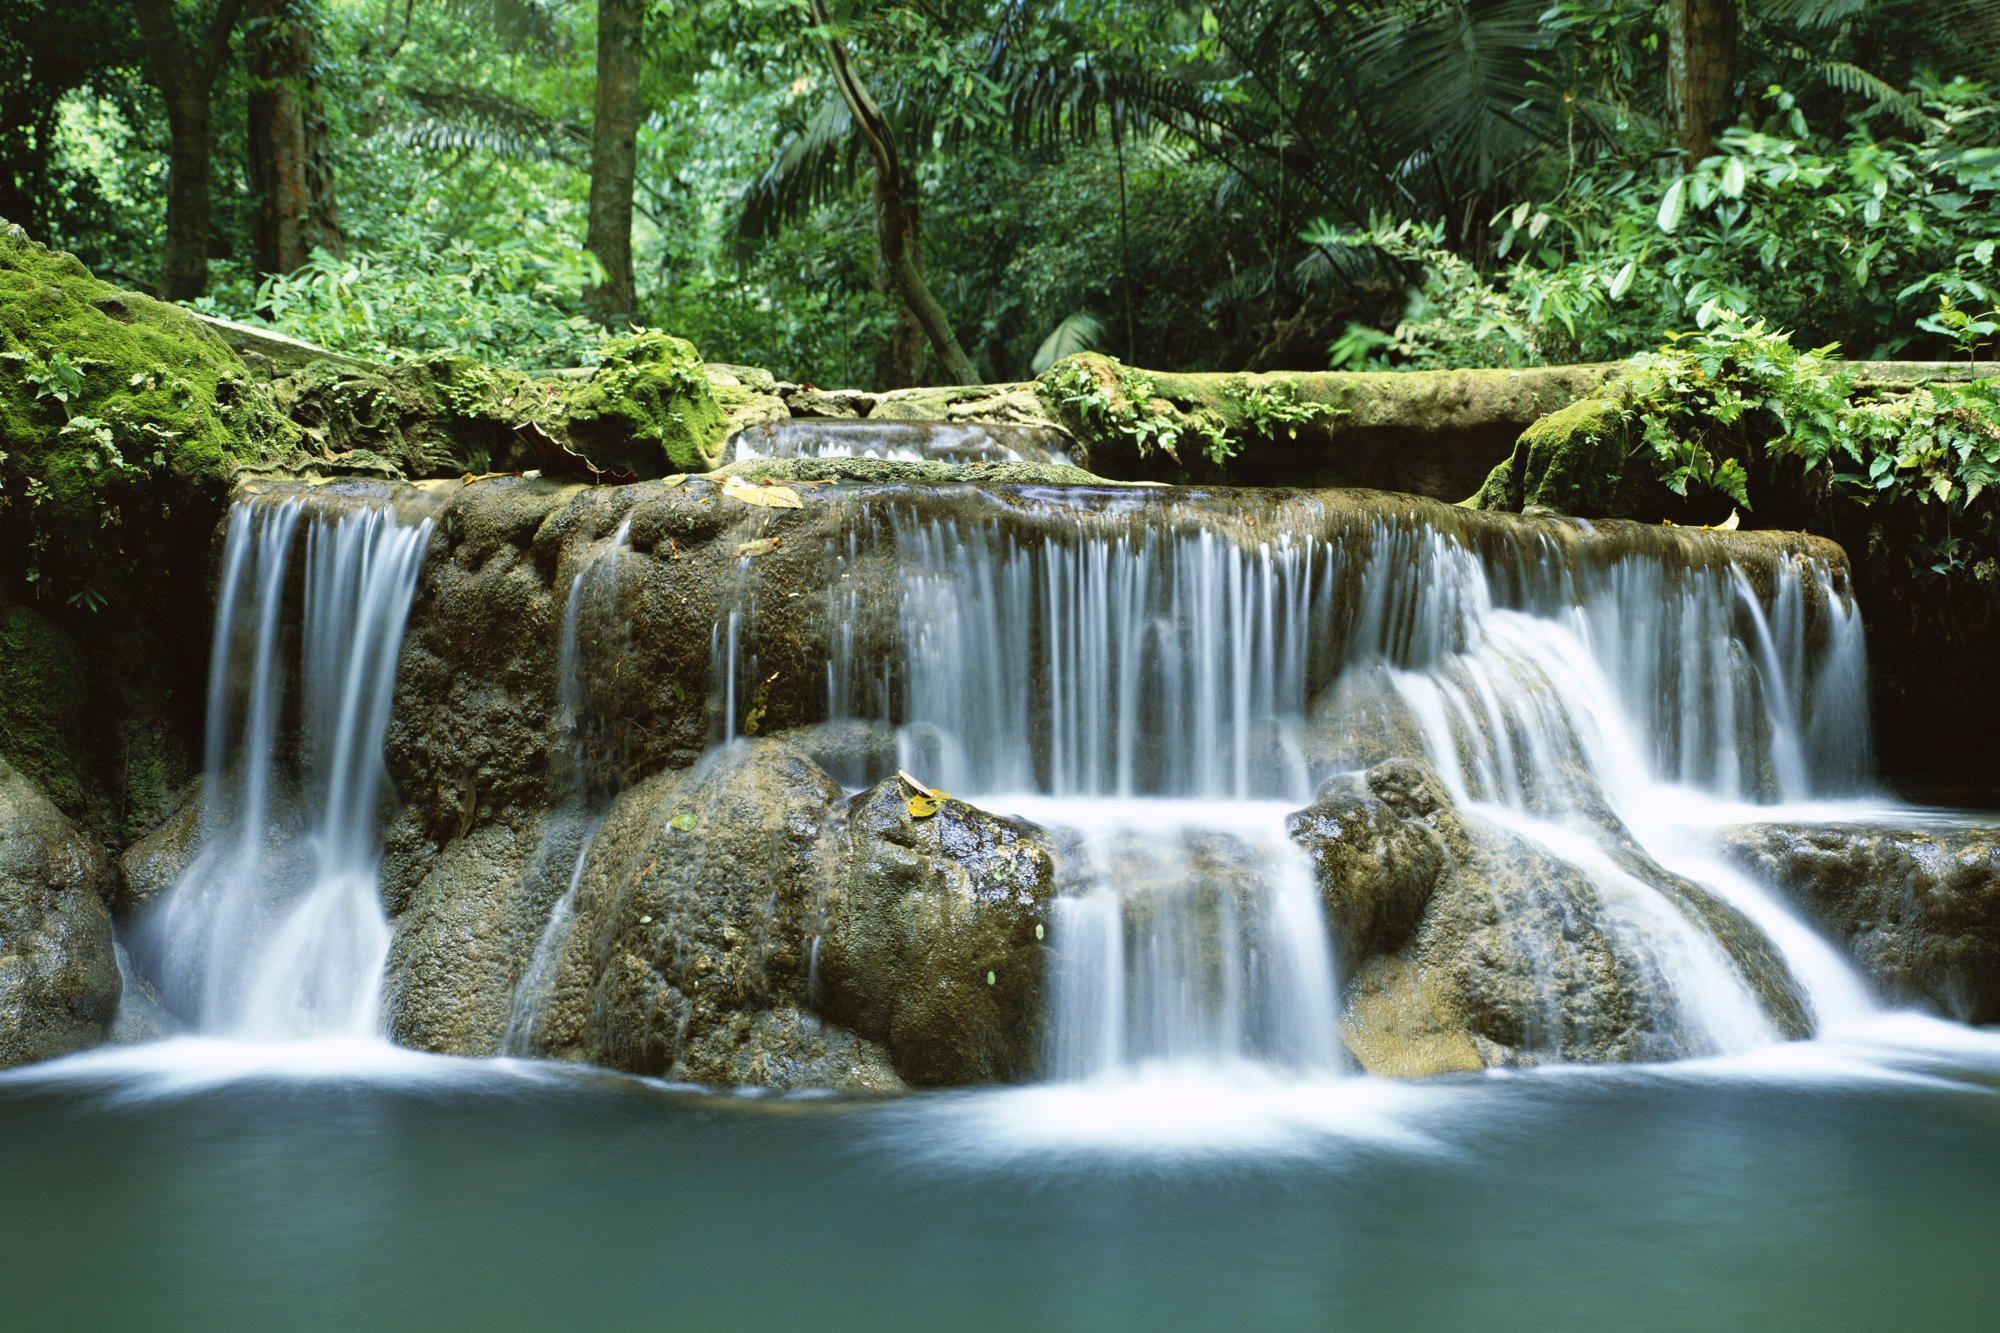 Real Tropical Waterfall Google Search Waterfall Wallpaper Waterfall Scenery